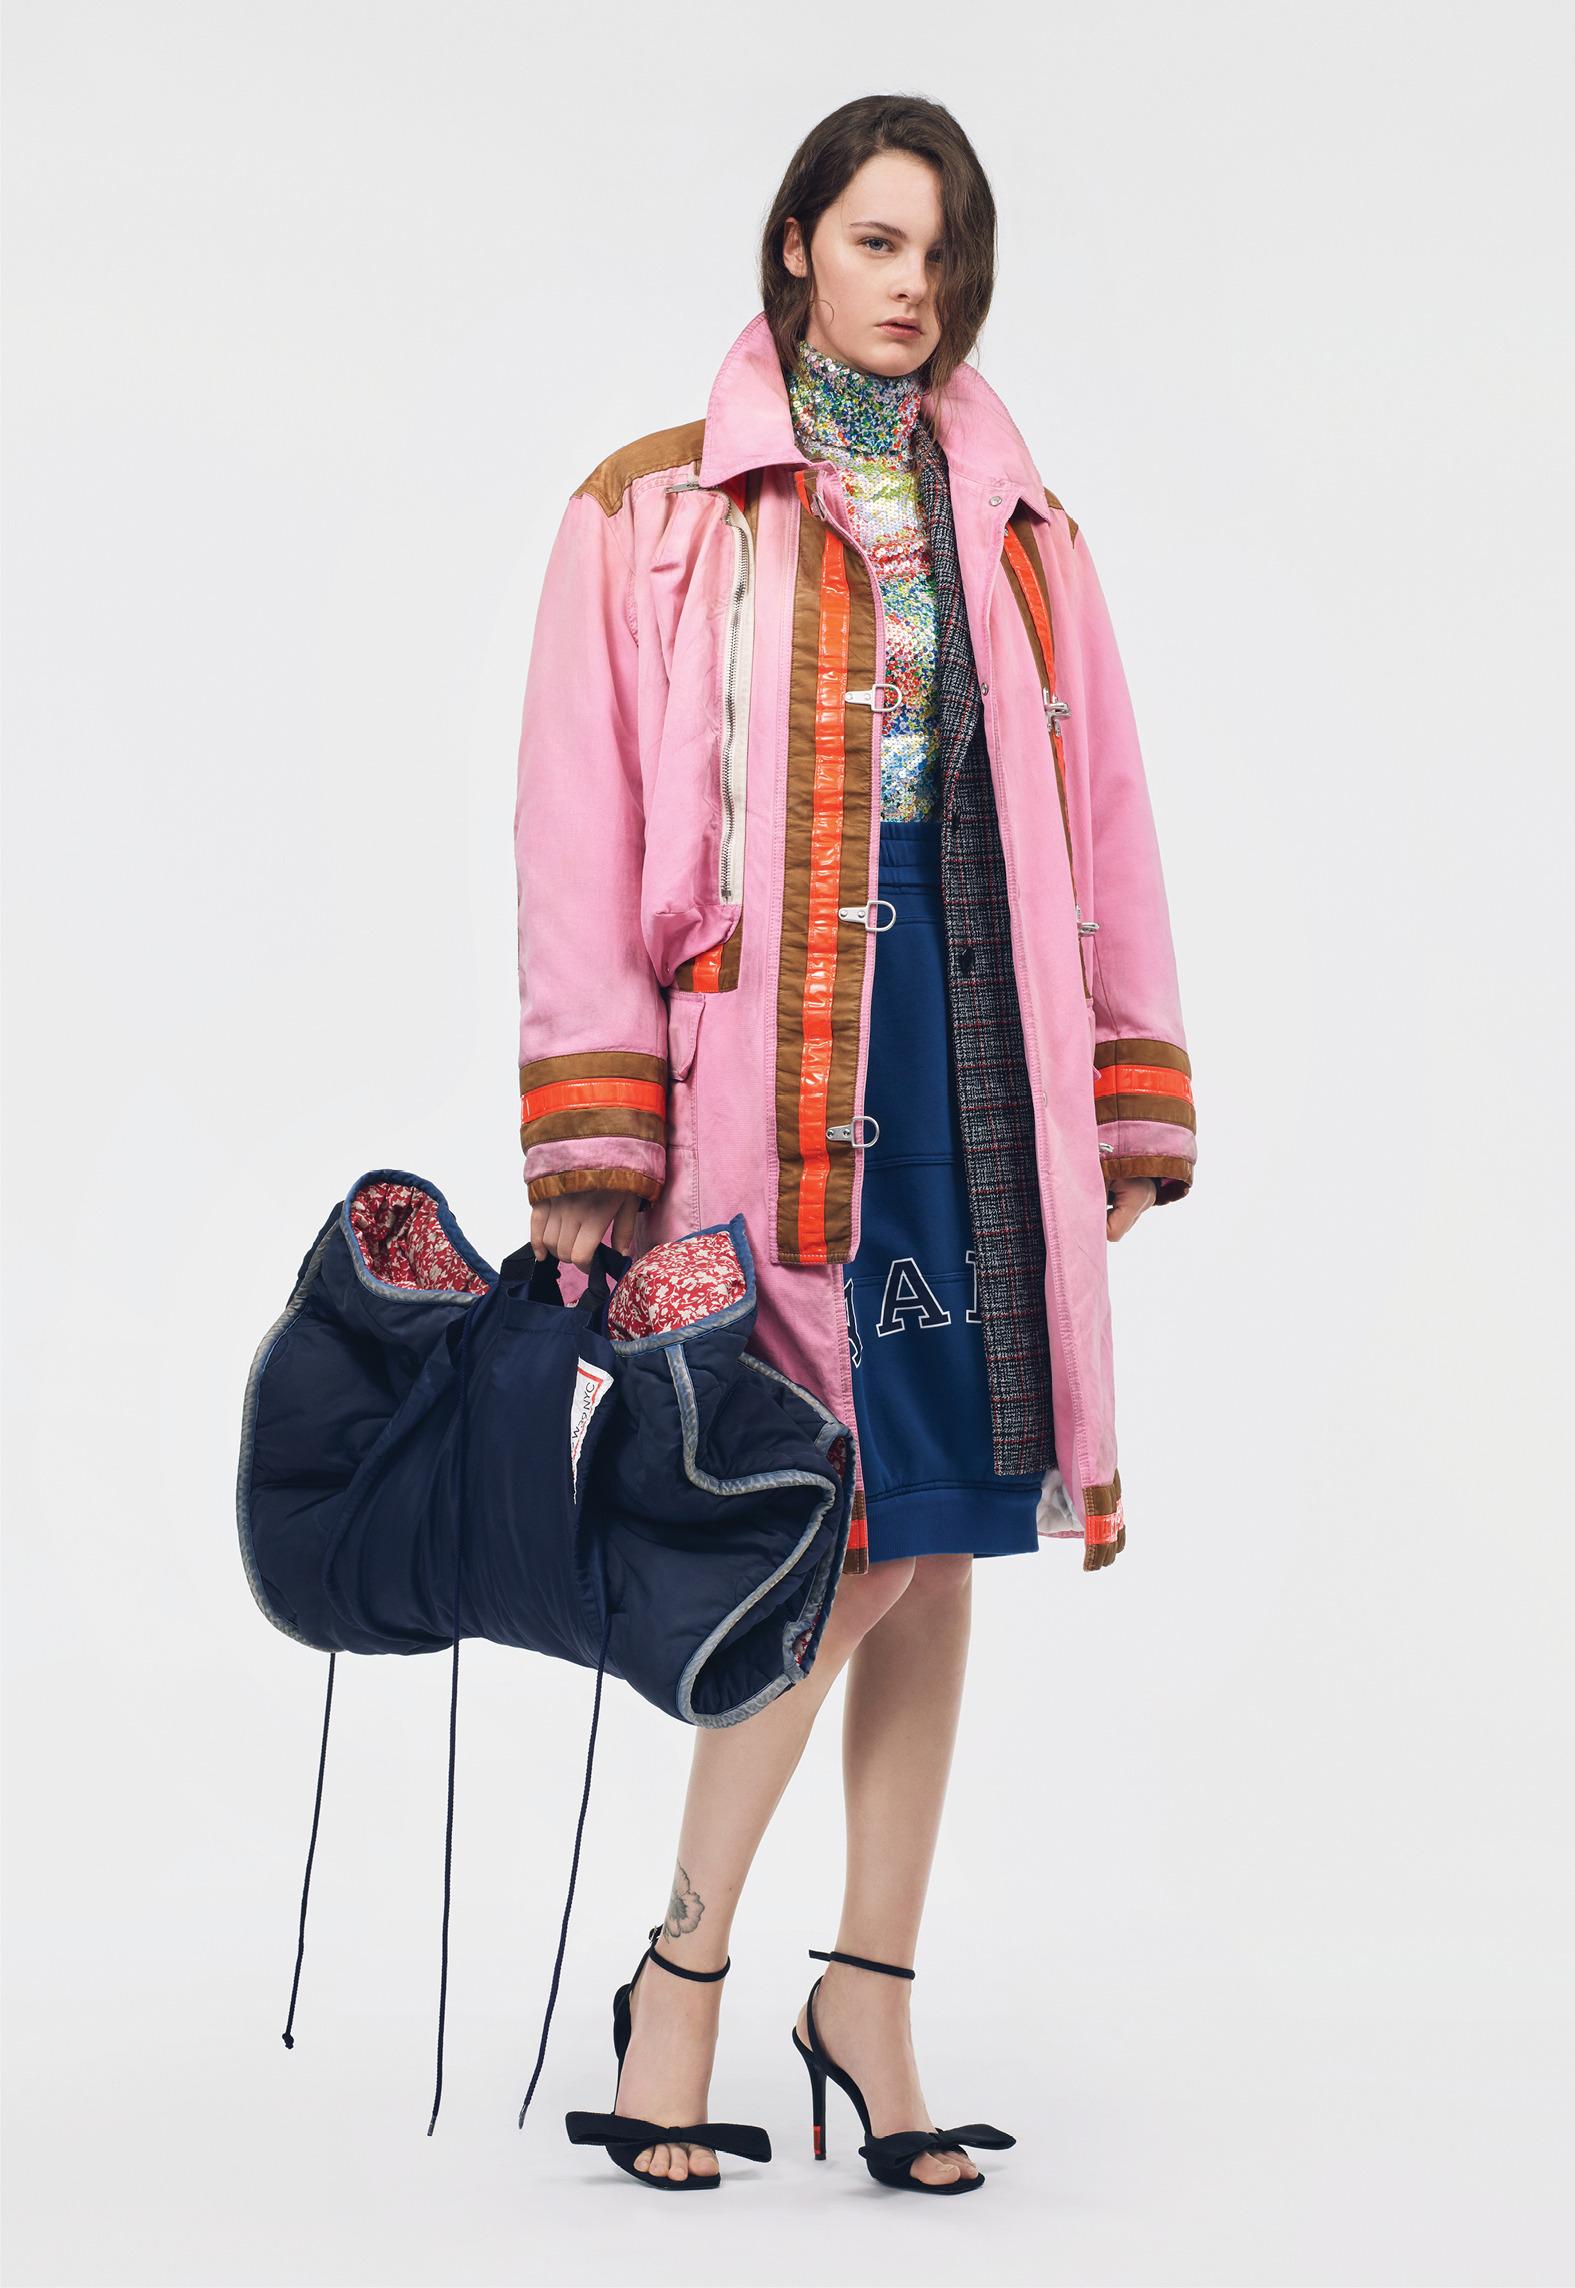 Forum on this topic: Calvin Klein Resort 2019 collection, calvin-klein-resort-2019-collection/